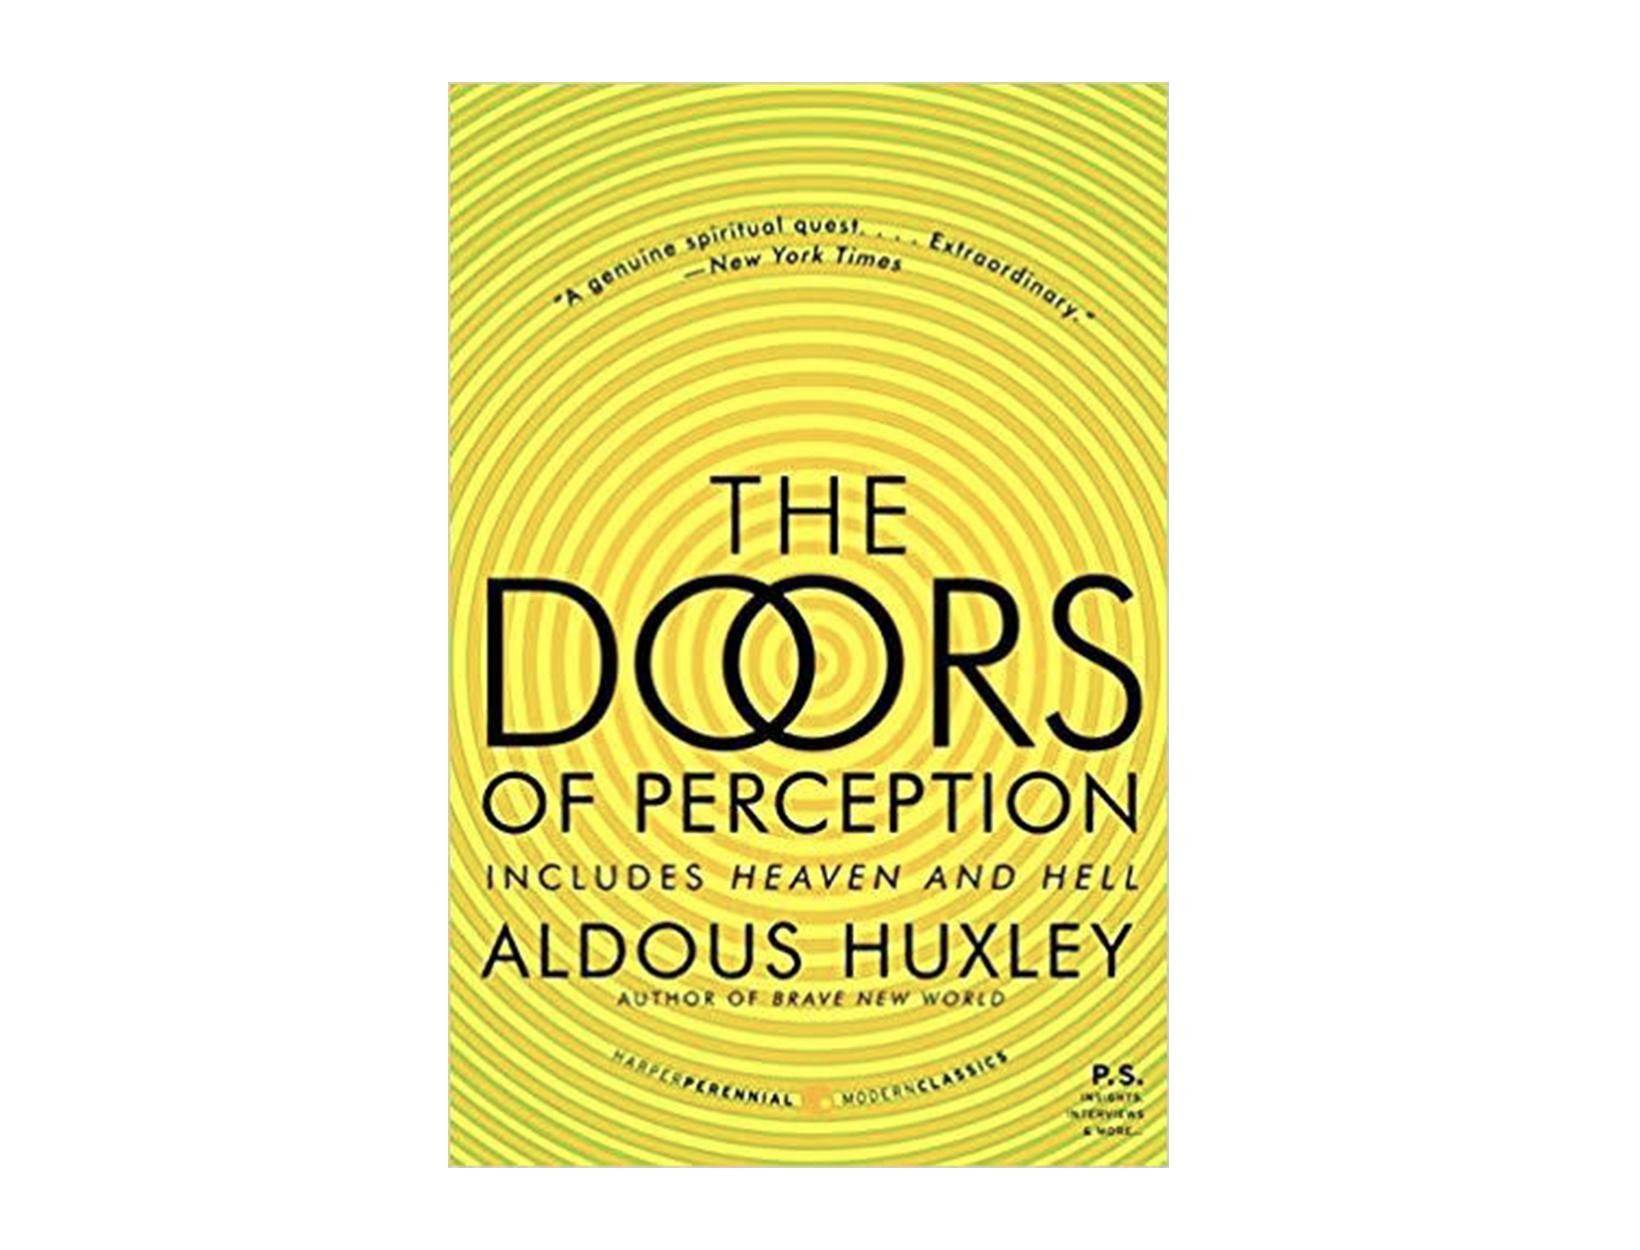 <em>The Doors of Perception</em> by Aldous Huxley